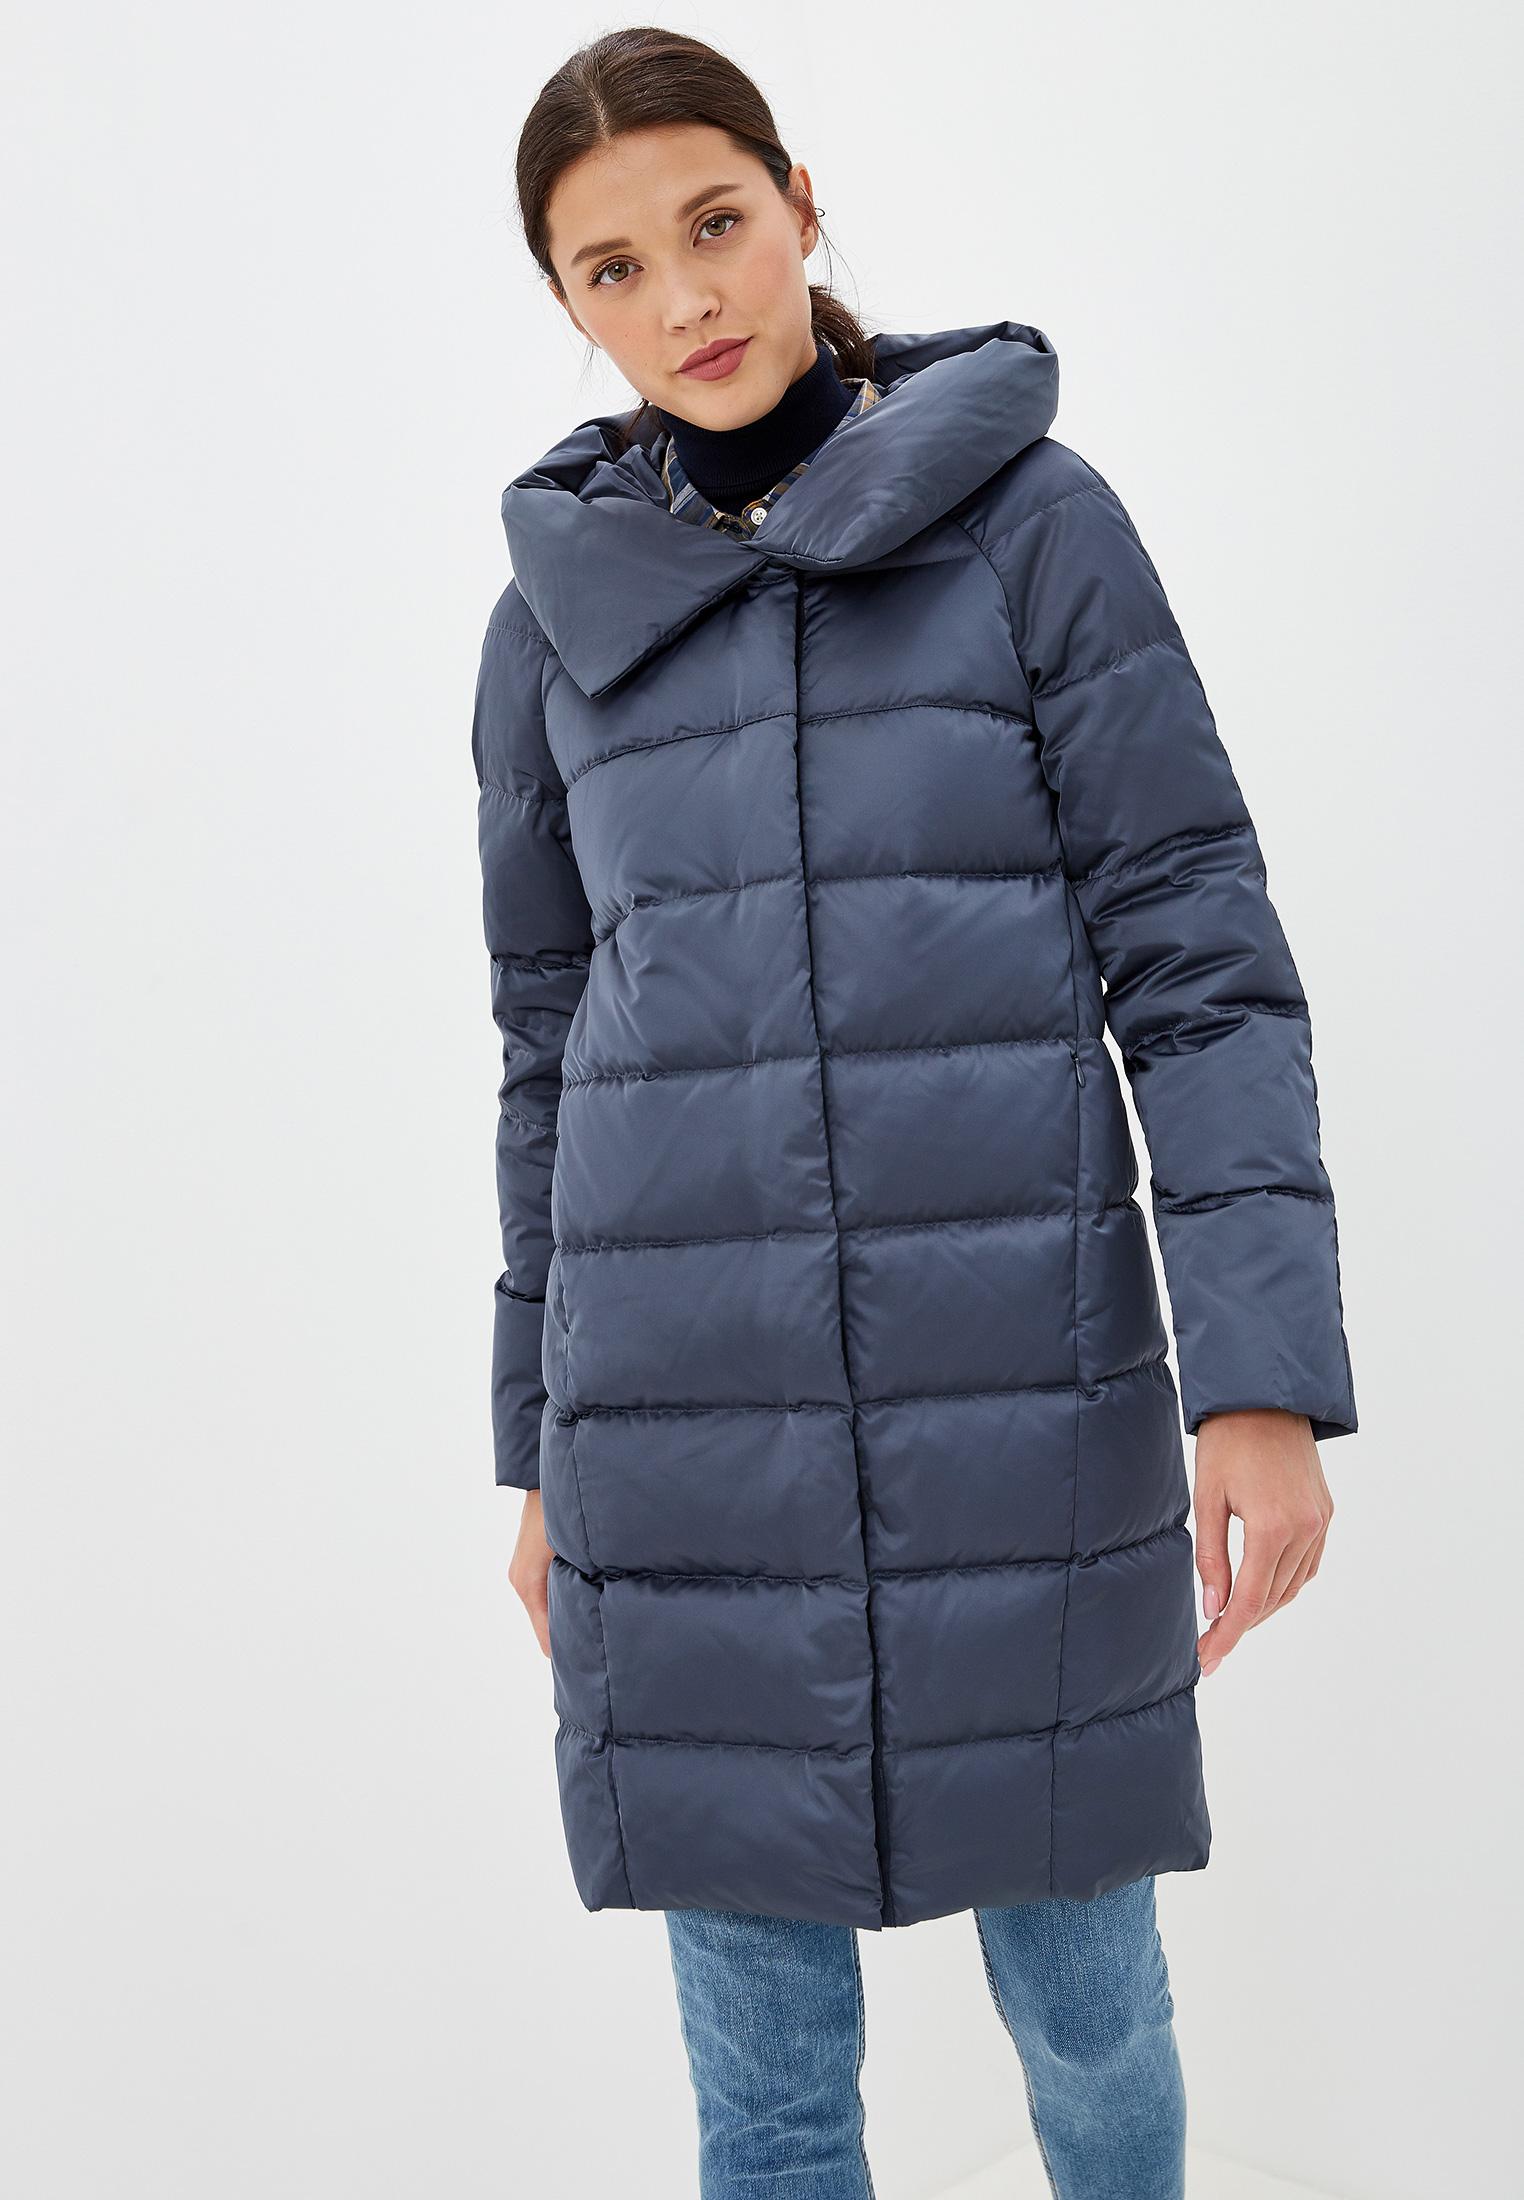 Пуховик, Savage, цвет: синий. Артикул: SA004EWGESA8. Одежда / Верхняя одежда / Пуховики и зимние куртки